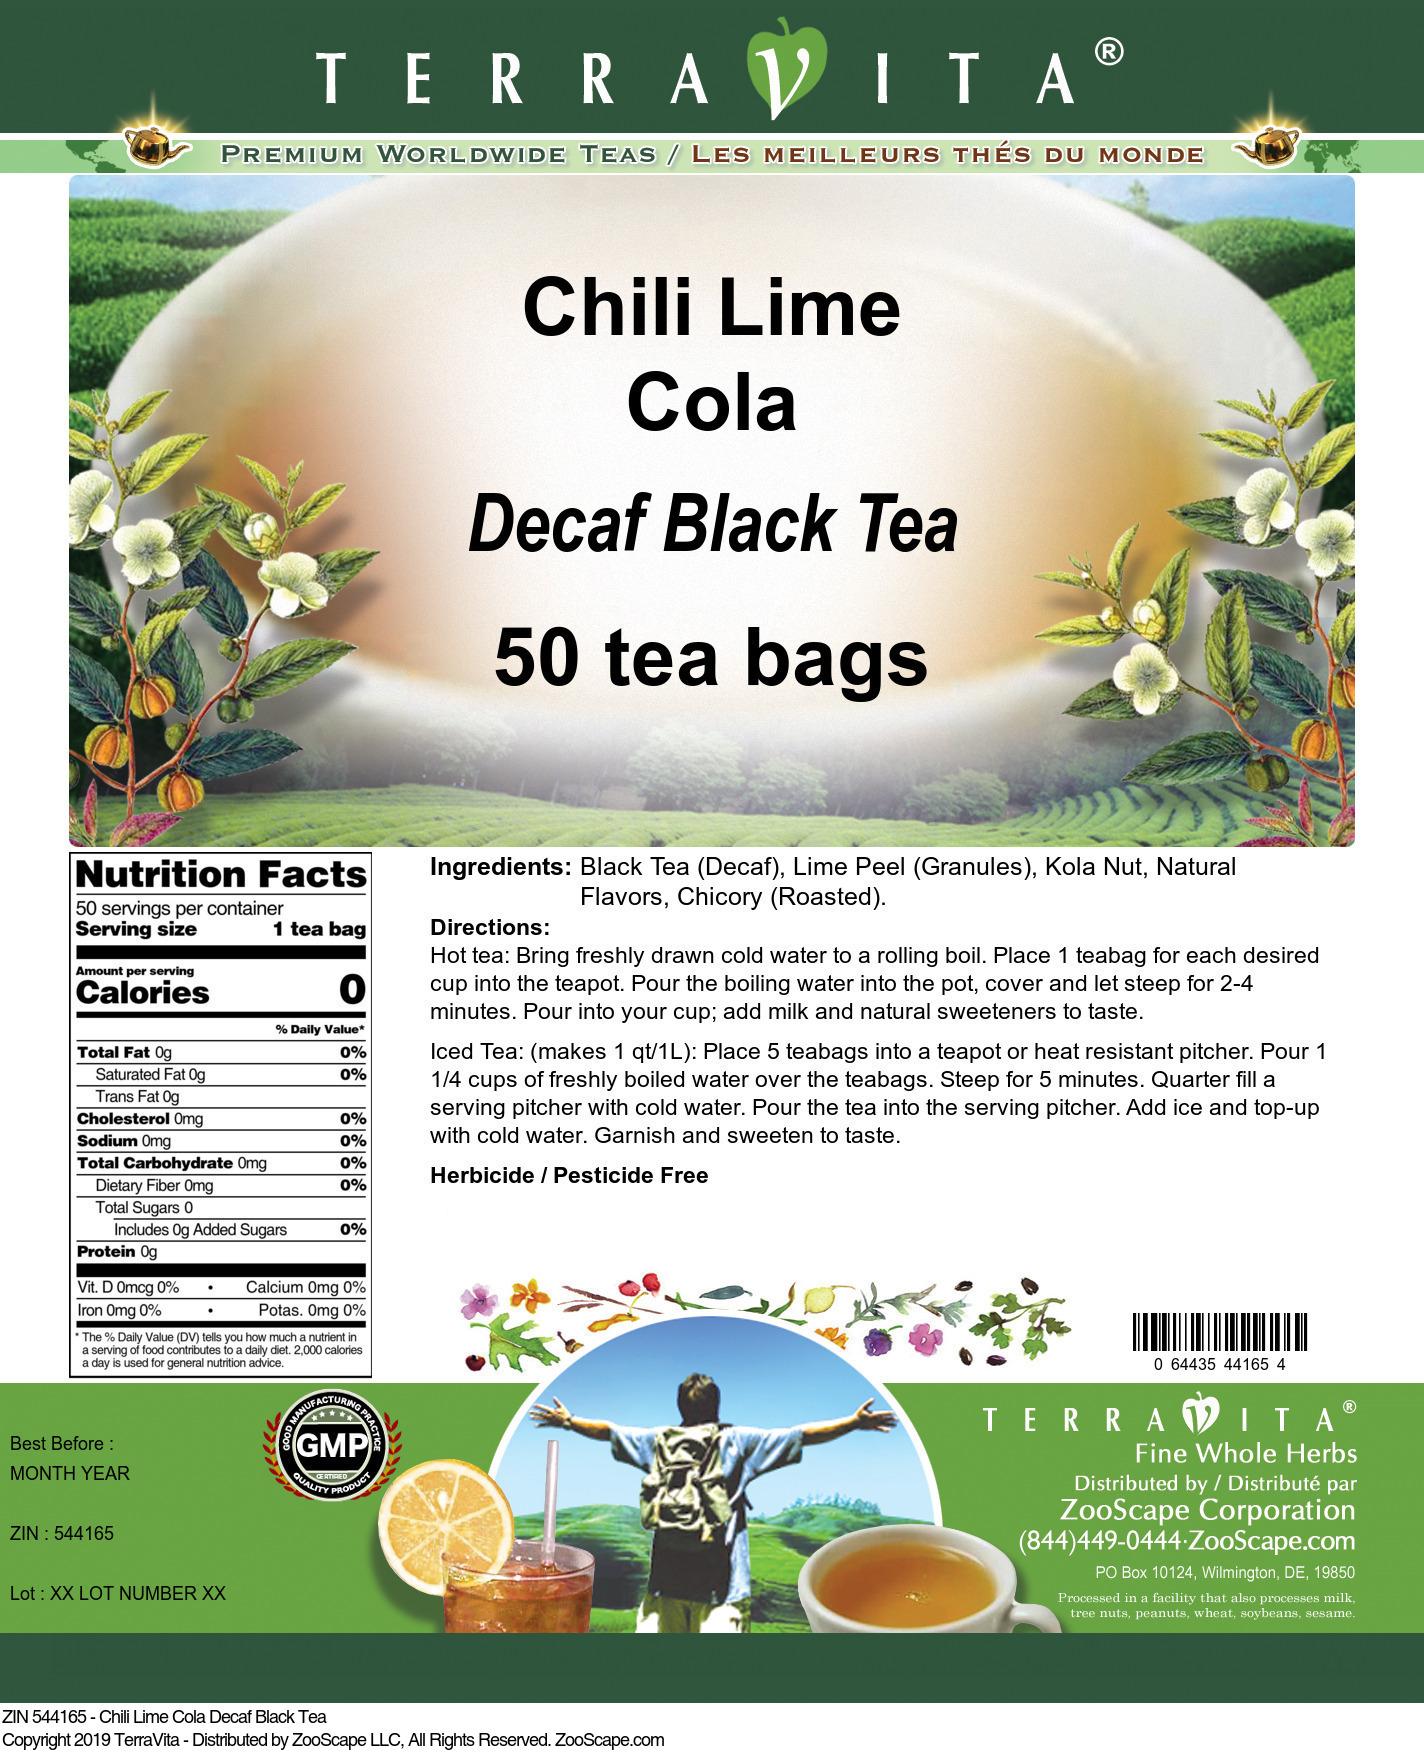 Chili Lime Cola Decaf Black Tea